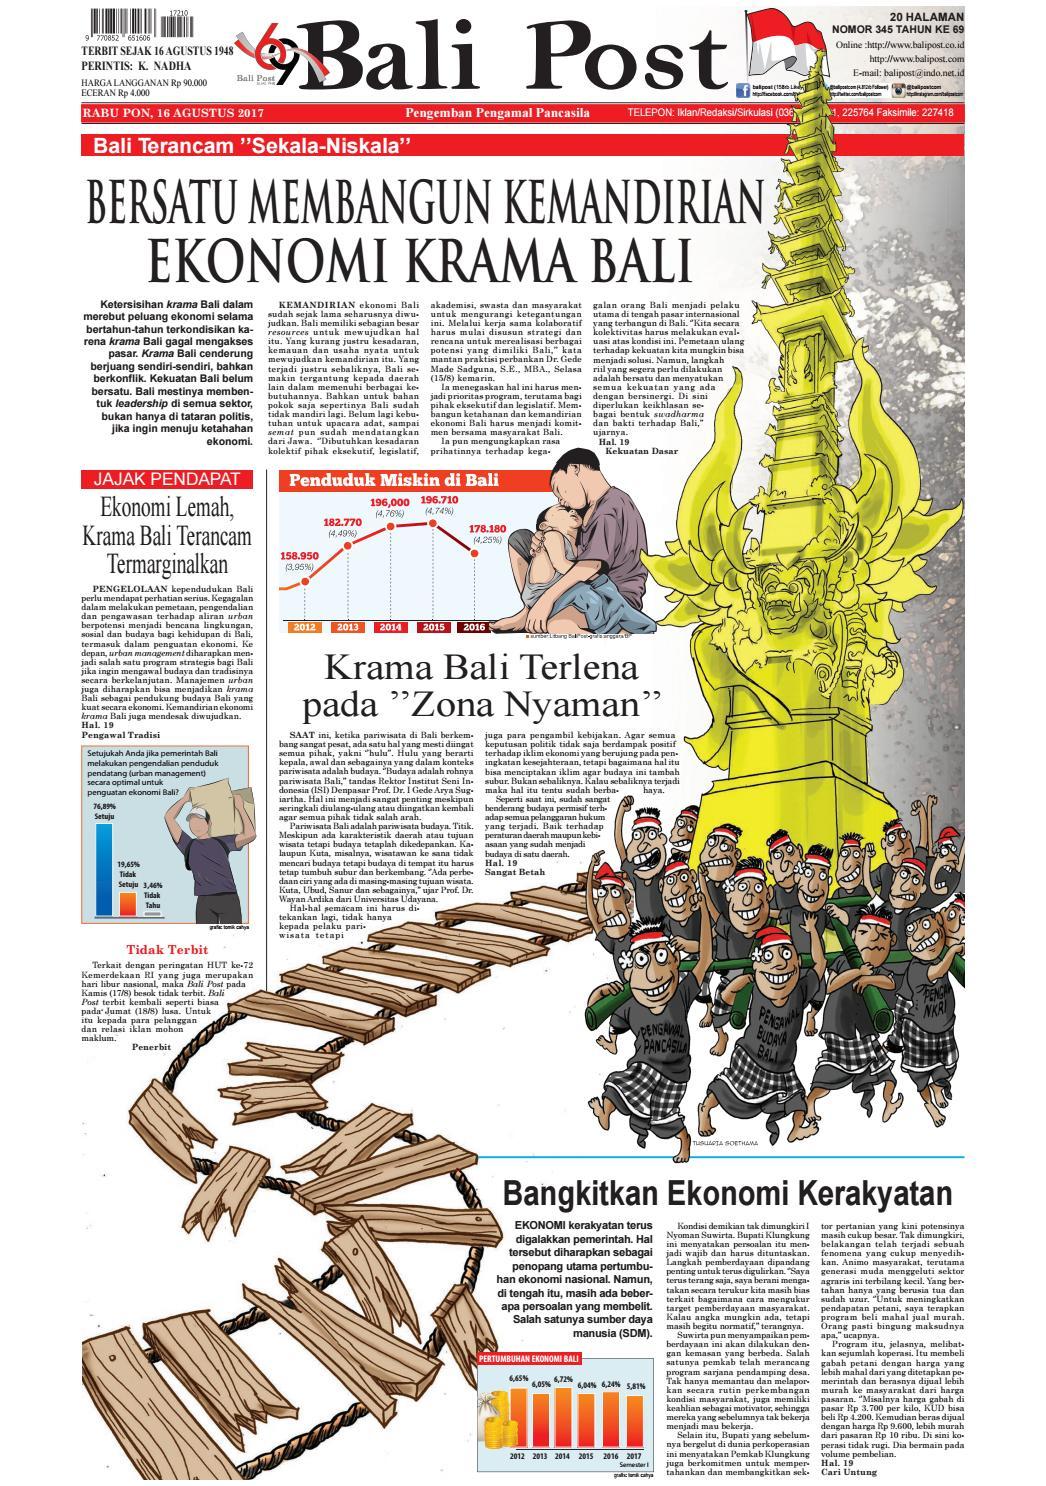 14 November 2016 By E Rakyat Aceh Issuu Rejeki Tcash Voucher Mcdonaldamp039s Rp 300000 Edisi 16 Agustus 2017 Balipostcom